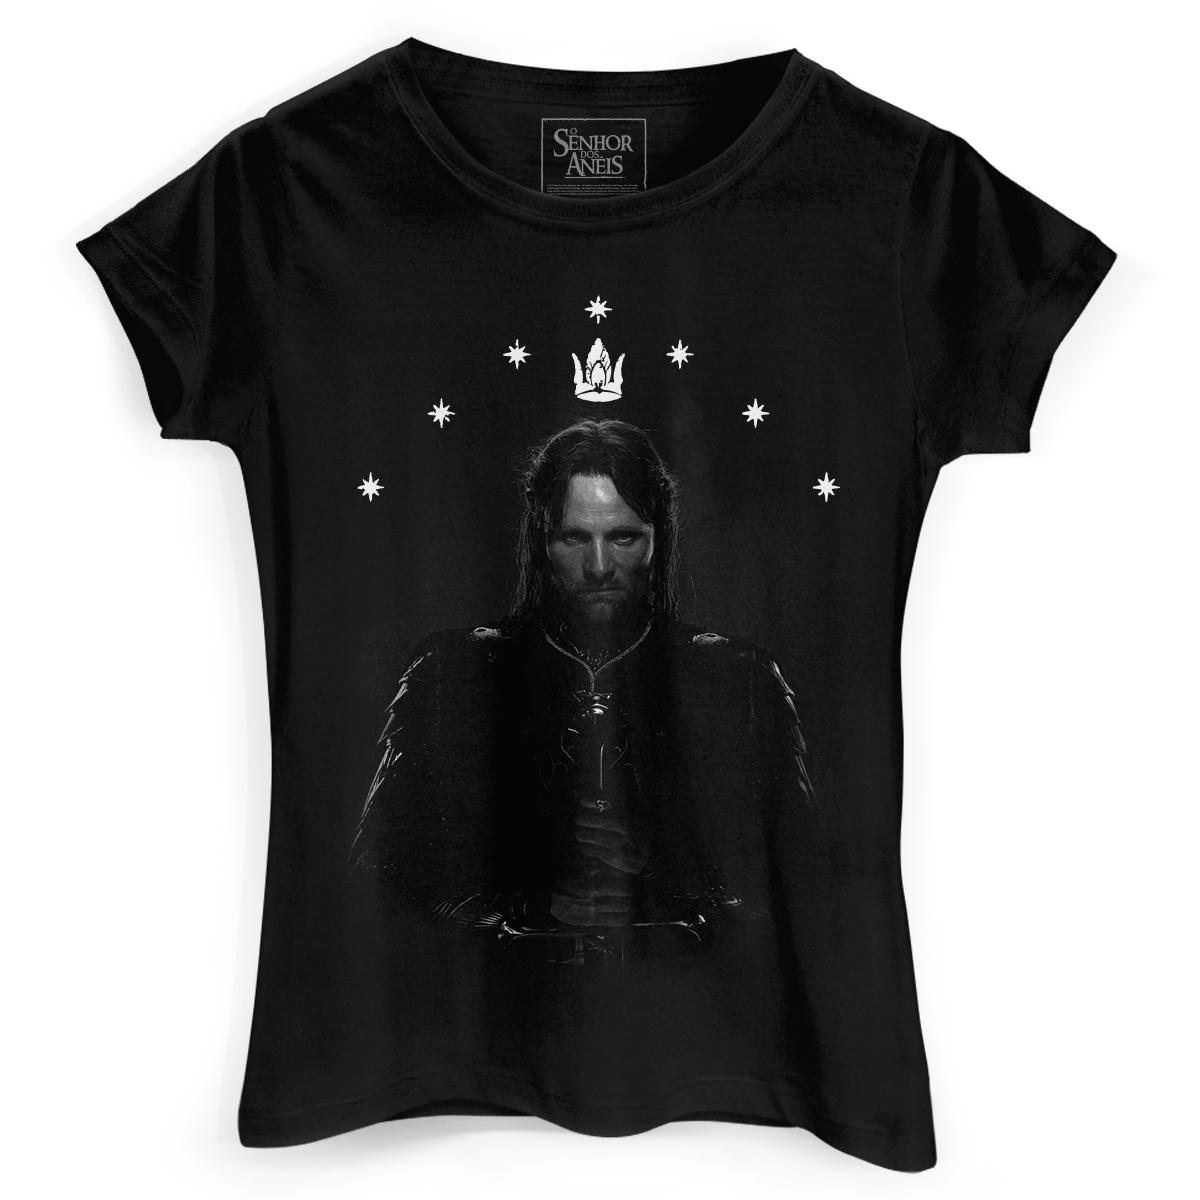 Camiseta Feminina O Senhor dos Anéis Aragorn